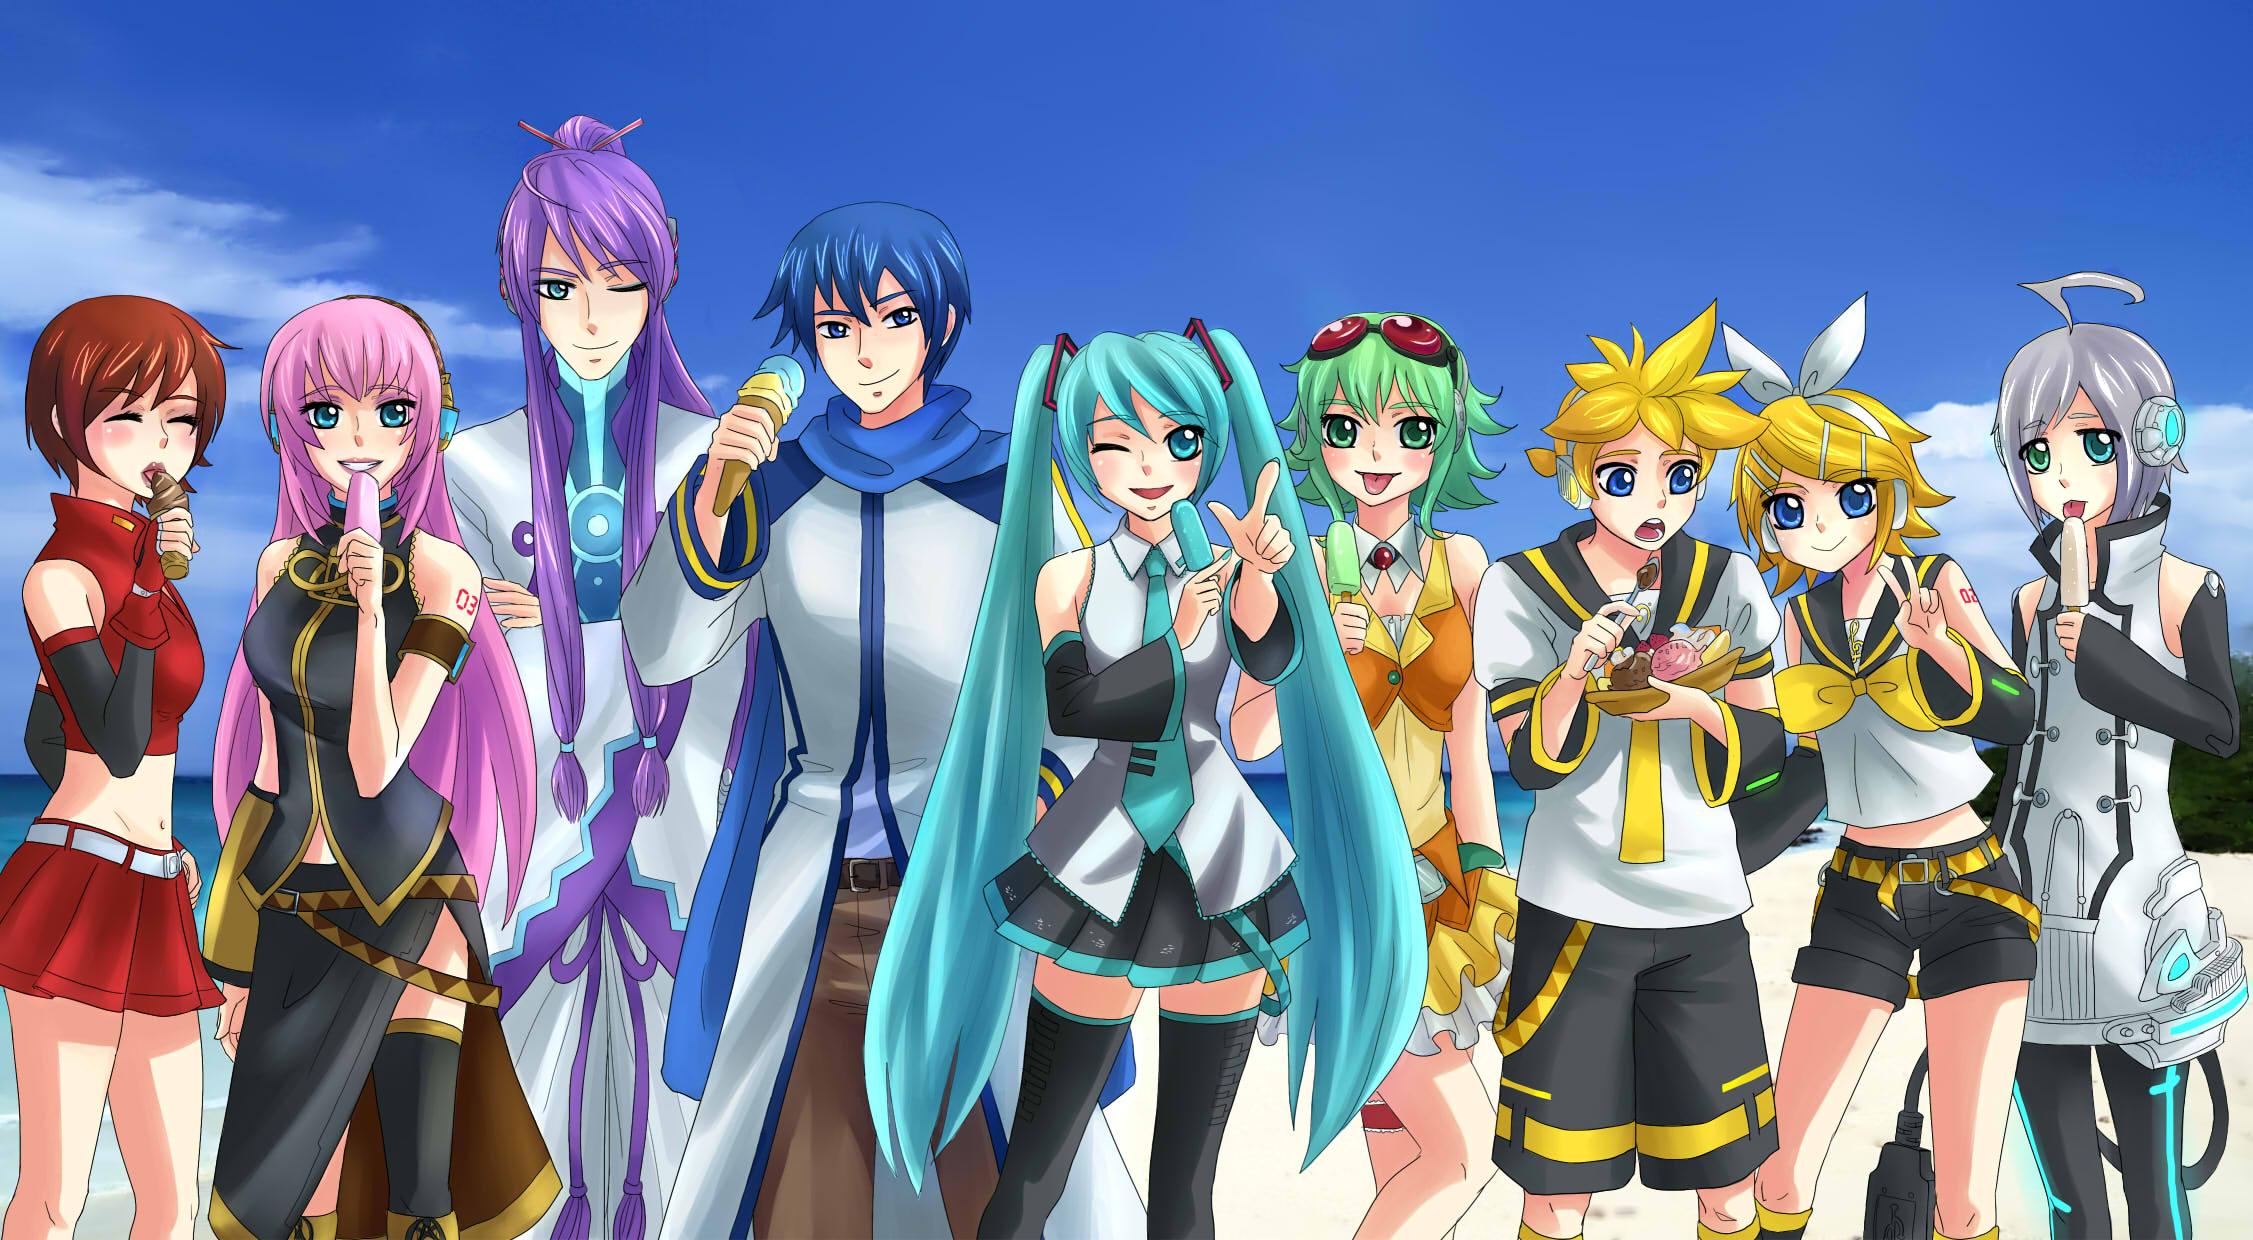 Vocaloid Chibi Group Wallpaper Vocaloid lovers! image...